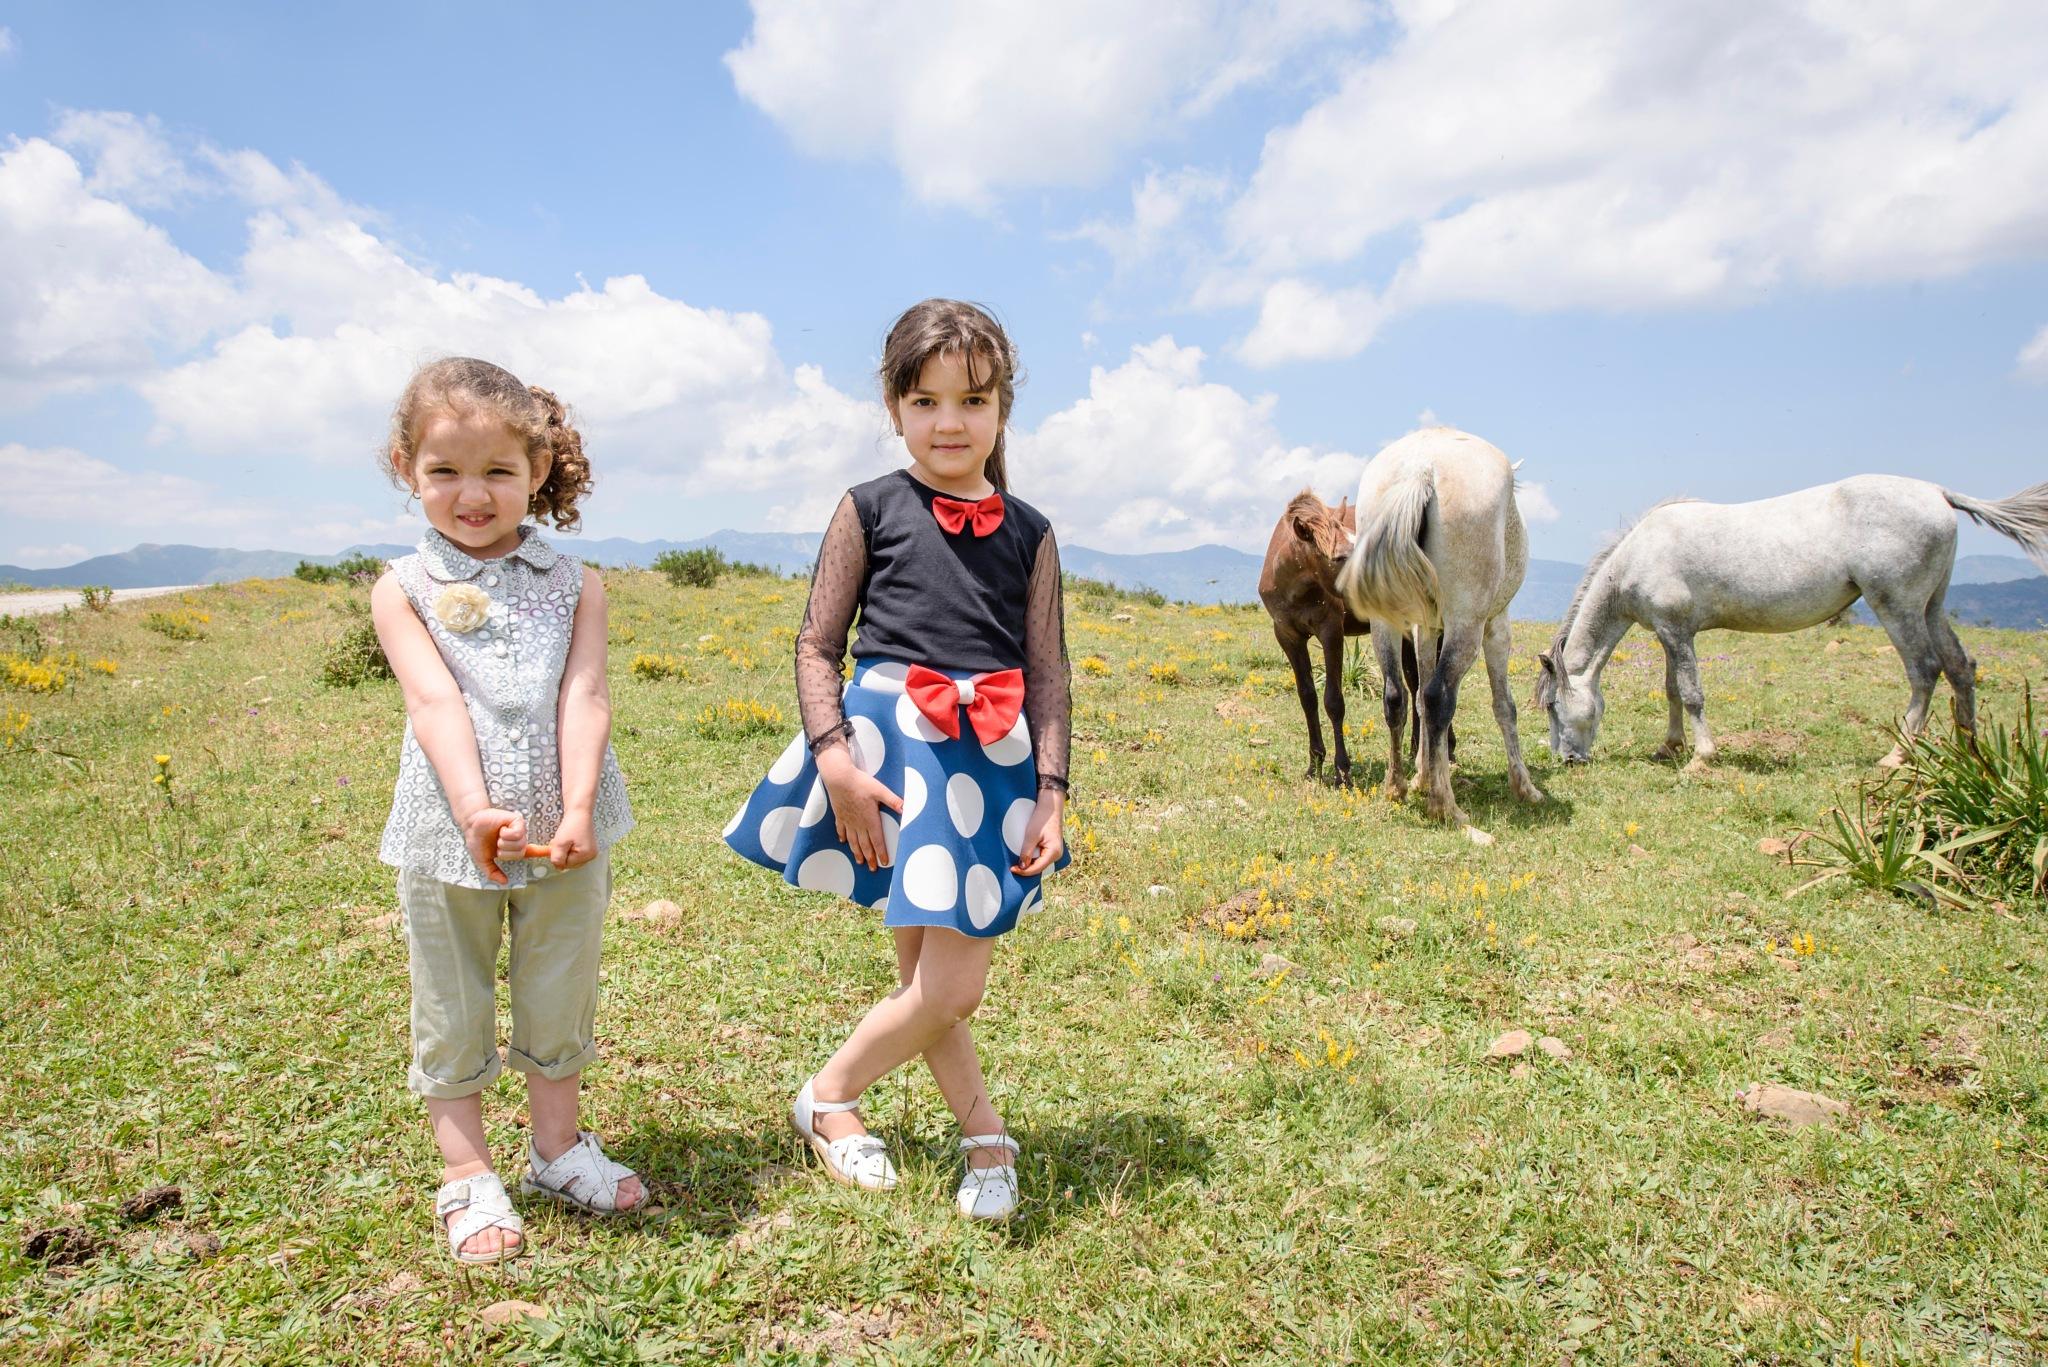 Girls and horses by Noureddine Belfethi